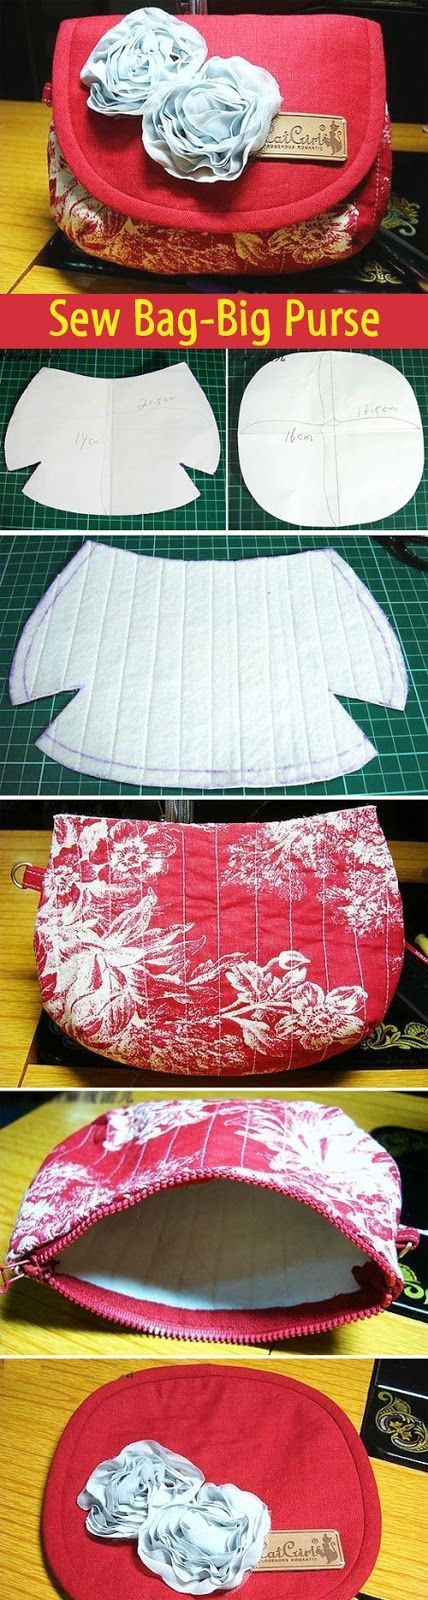 Sew Bag-Big Purse. DIY tutorial with patterns. http://www.handmadiya.com/2012/04/blog-post_28.html: